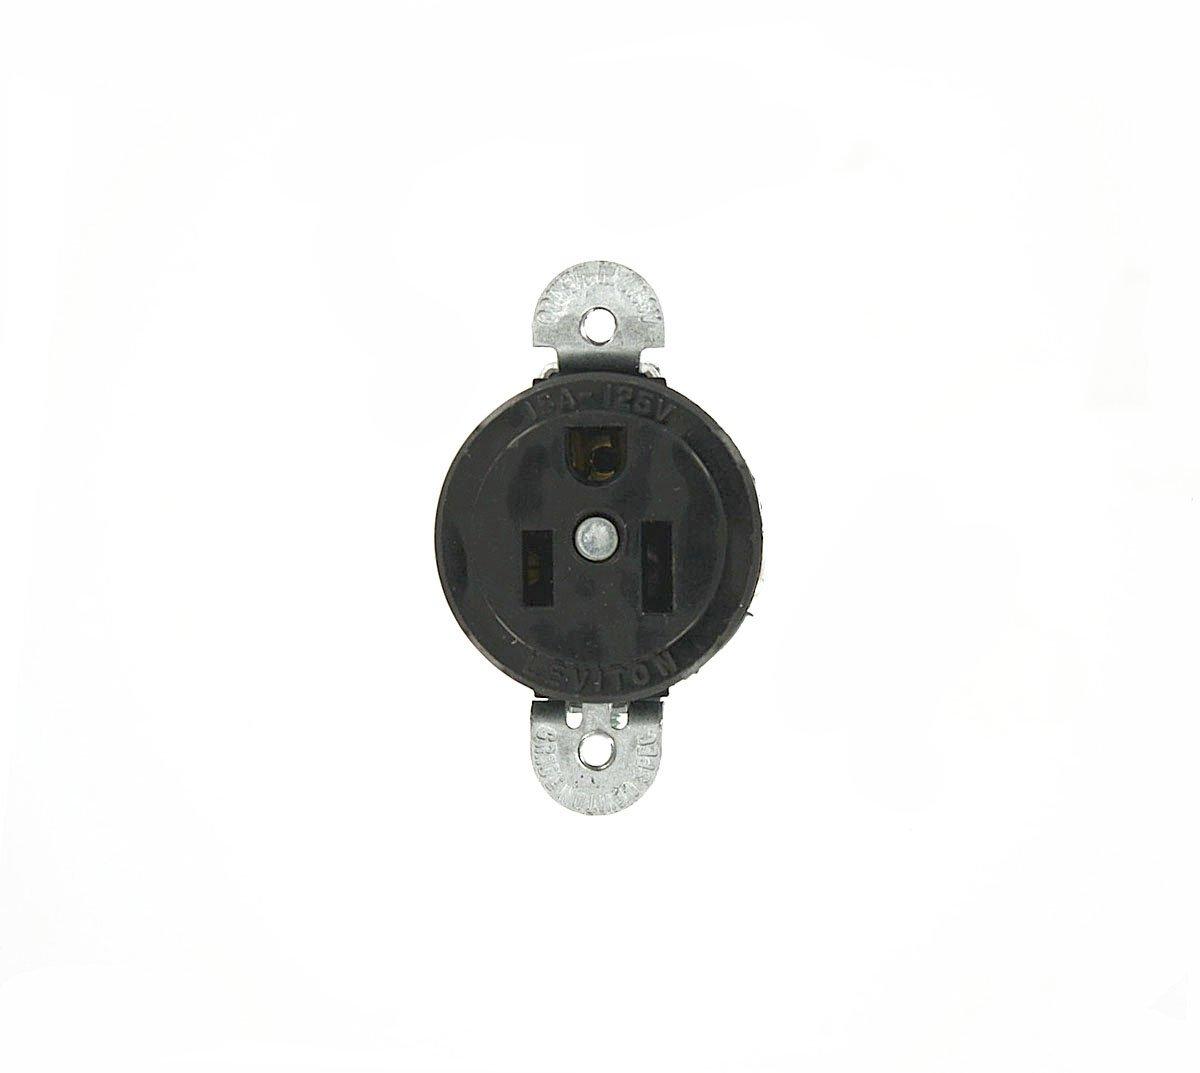 Leviton 5258-SS 15 Amp, 125 Volt, Short Strap Single Receptacle, Straight Blade, Heavy Duty Spec Grade, Grounding, Black